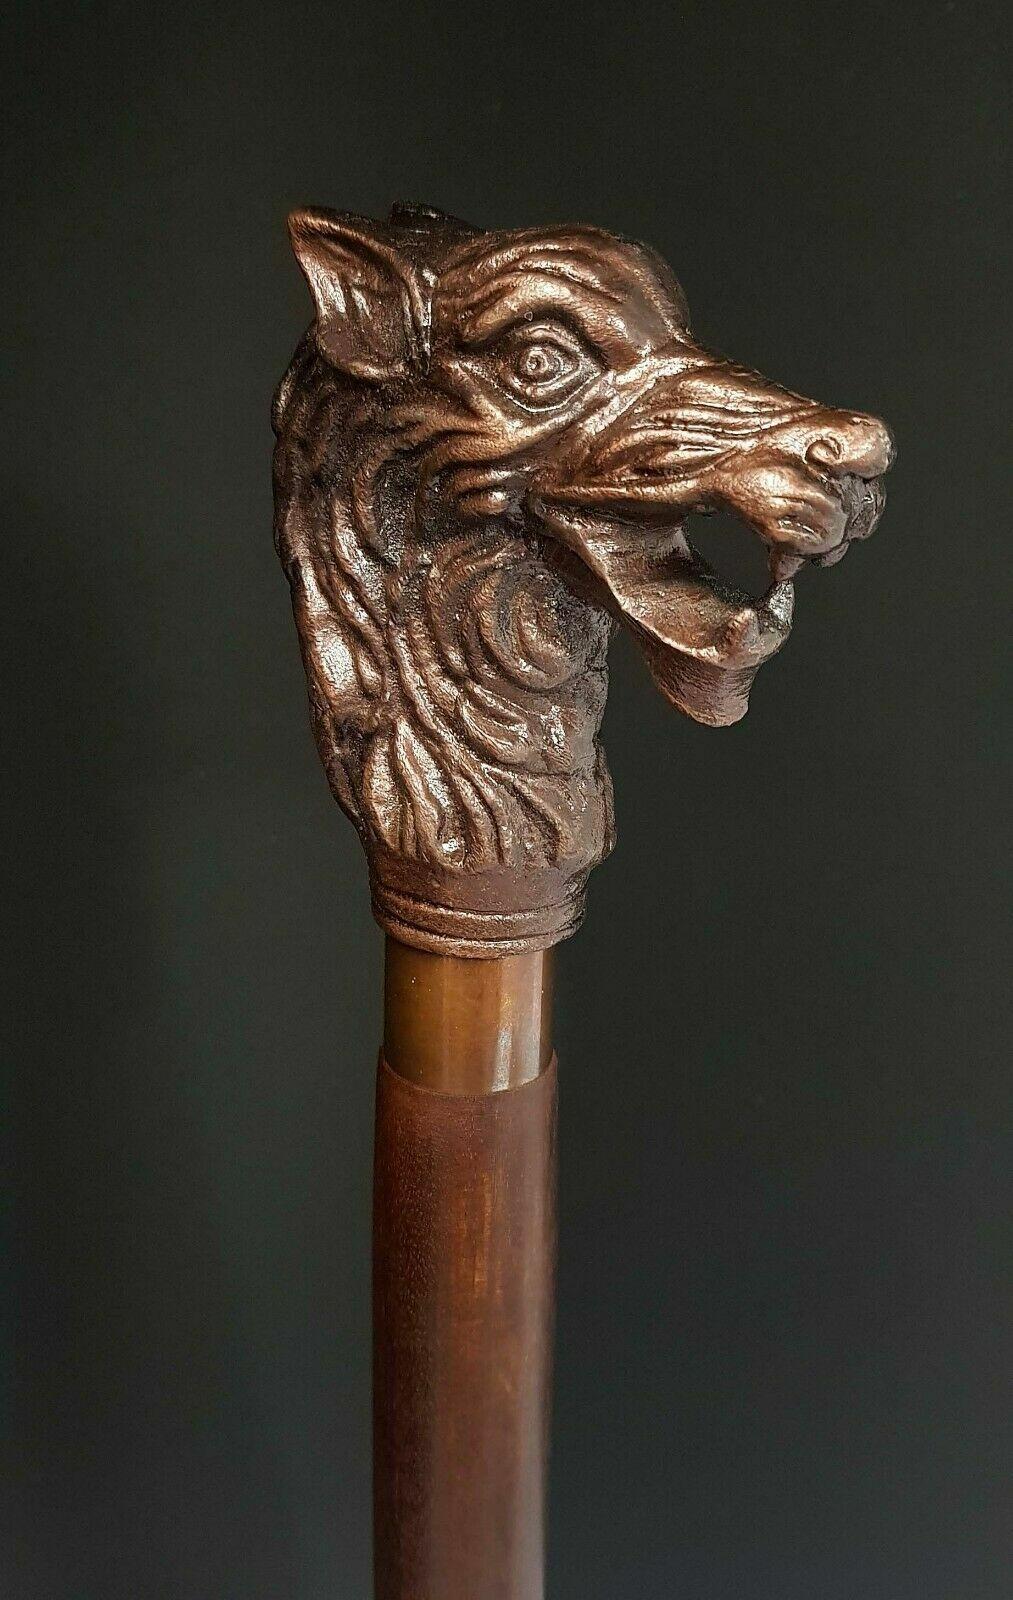 Antique Walking Stick Brass Lion Head Cane Walker cane Vintage Gift handmade